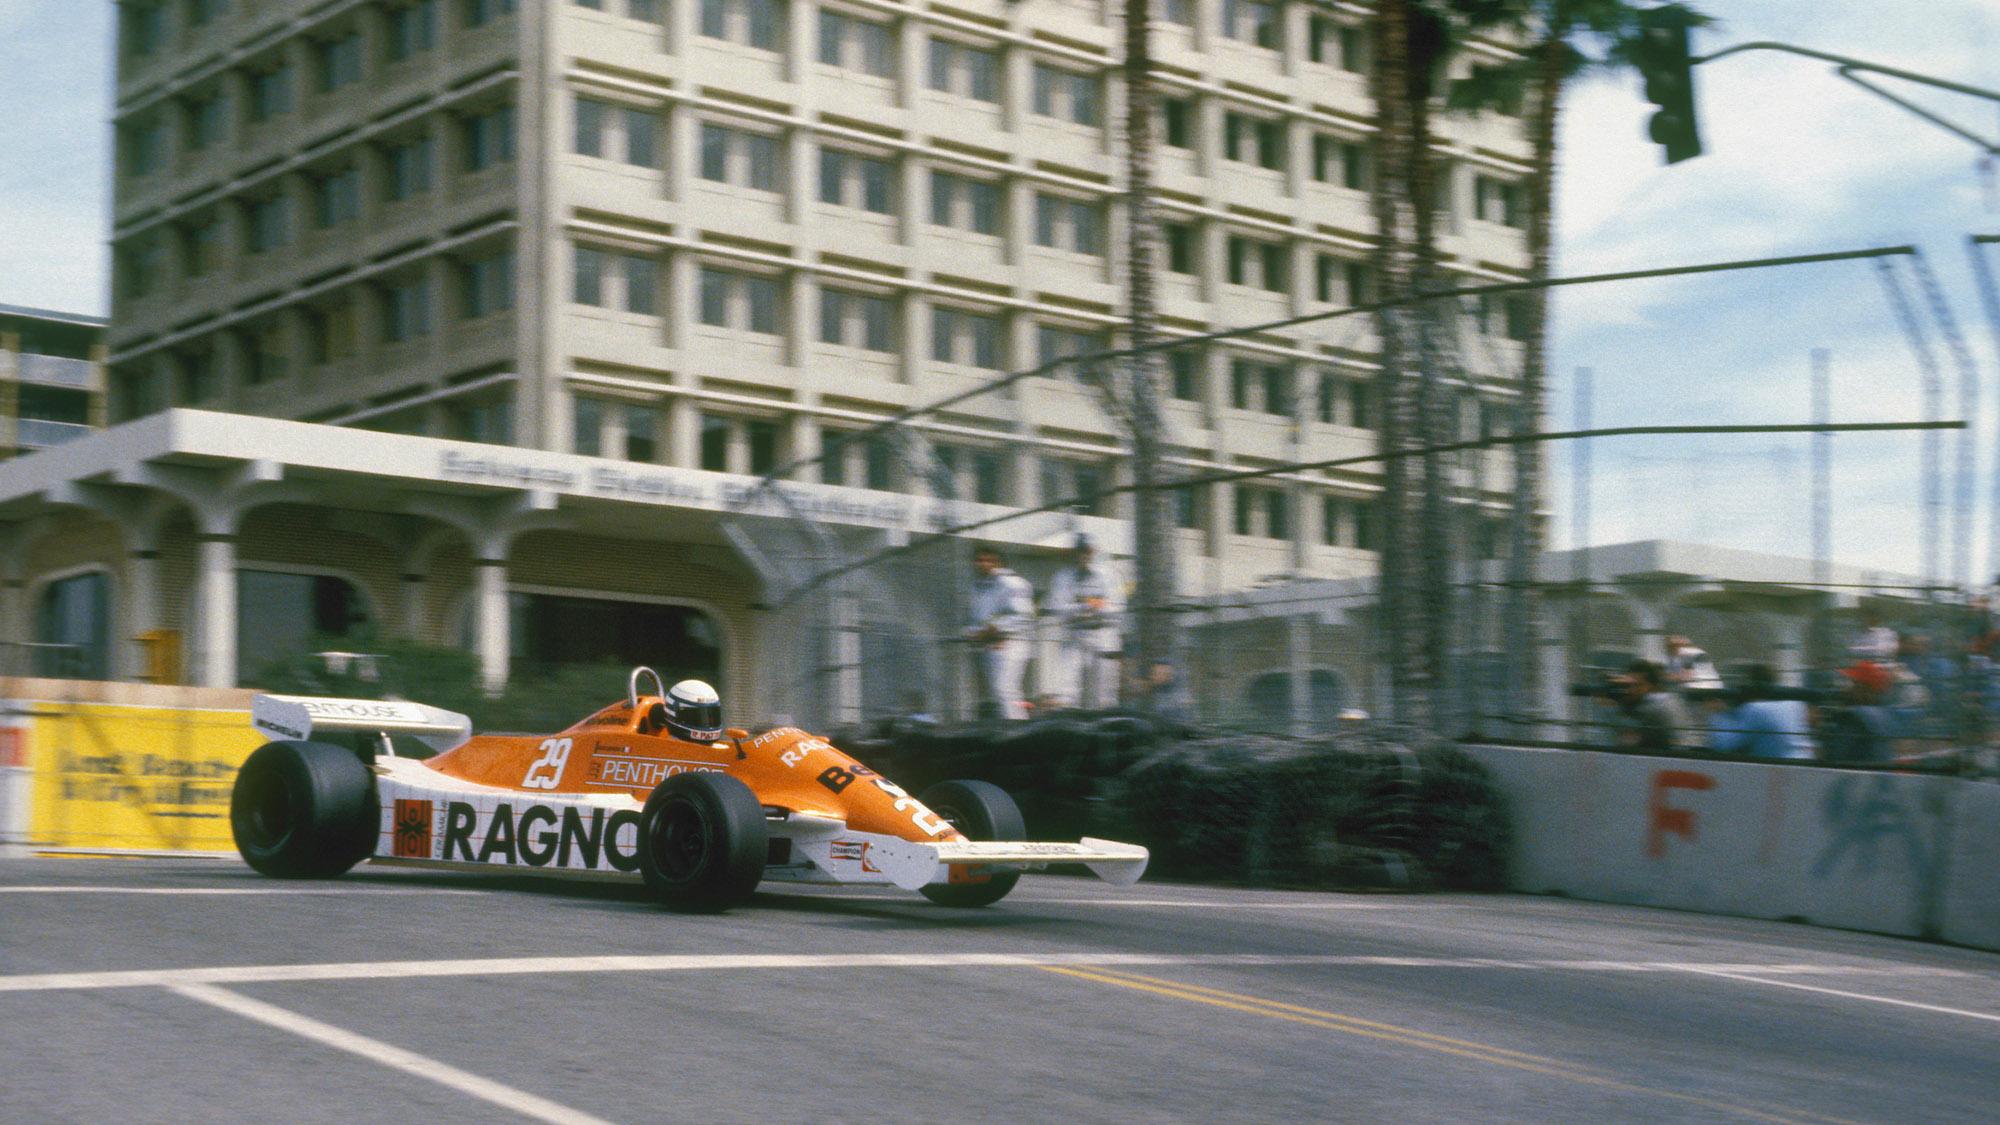 Riccardo Patrese at the 1981 Long Beach Grand Prix